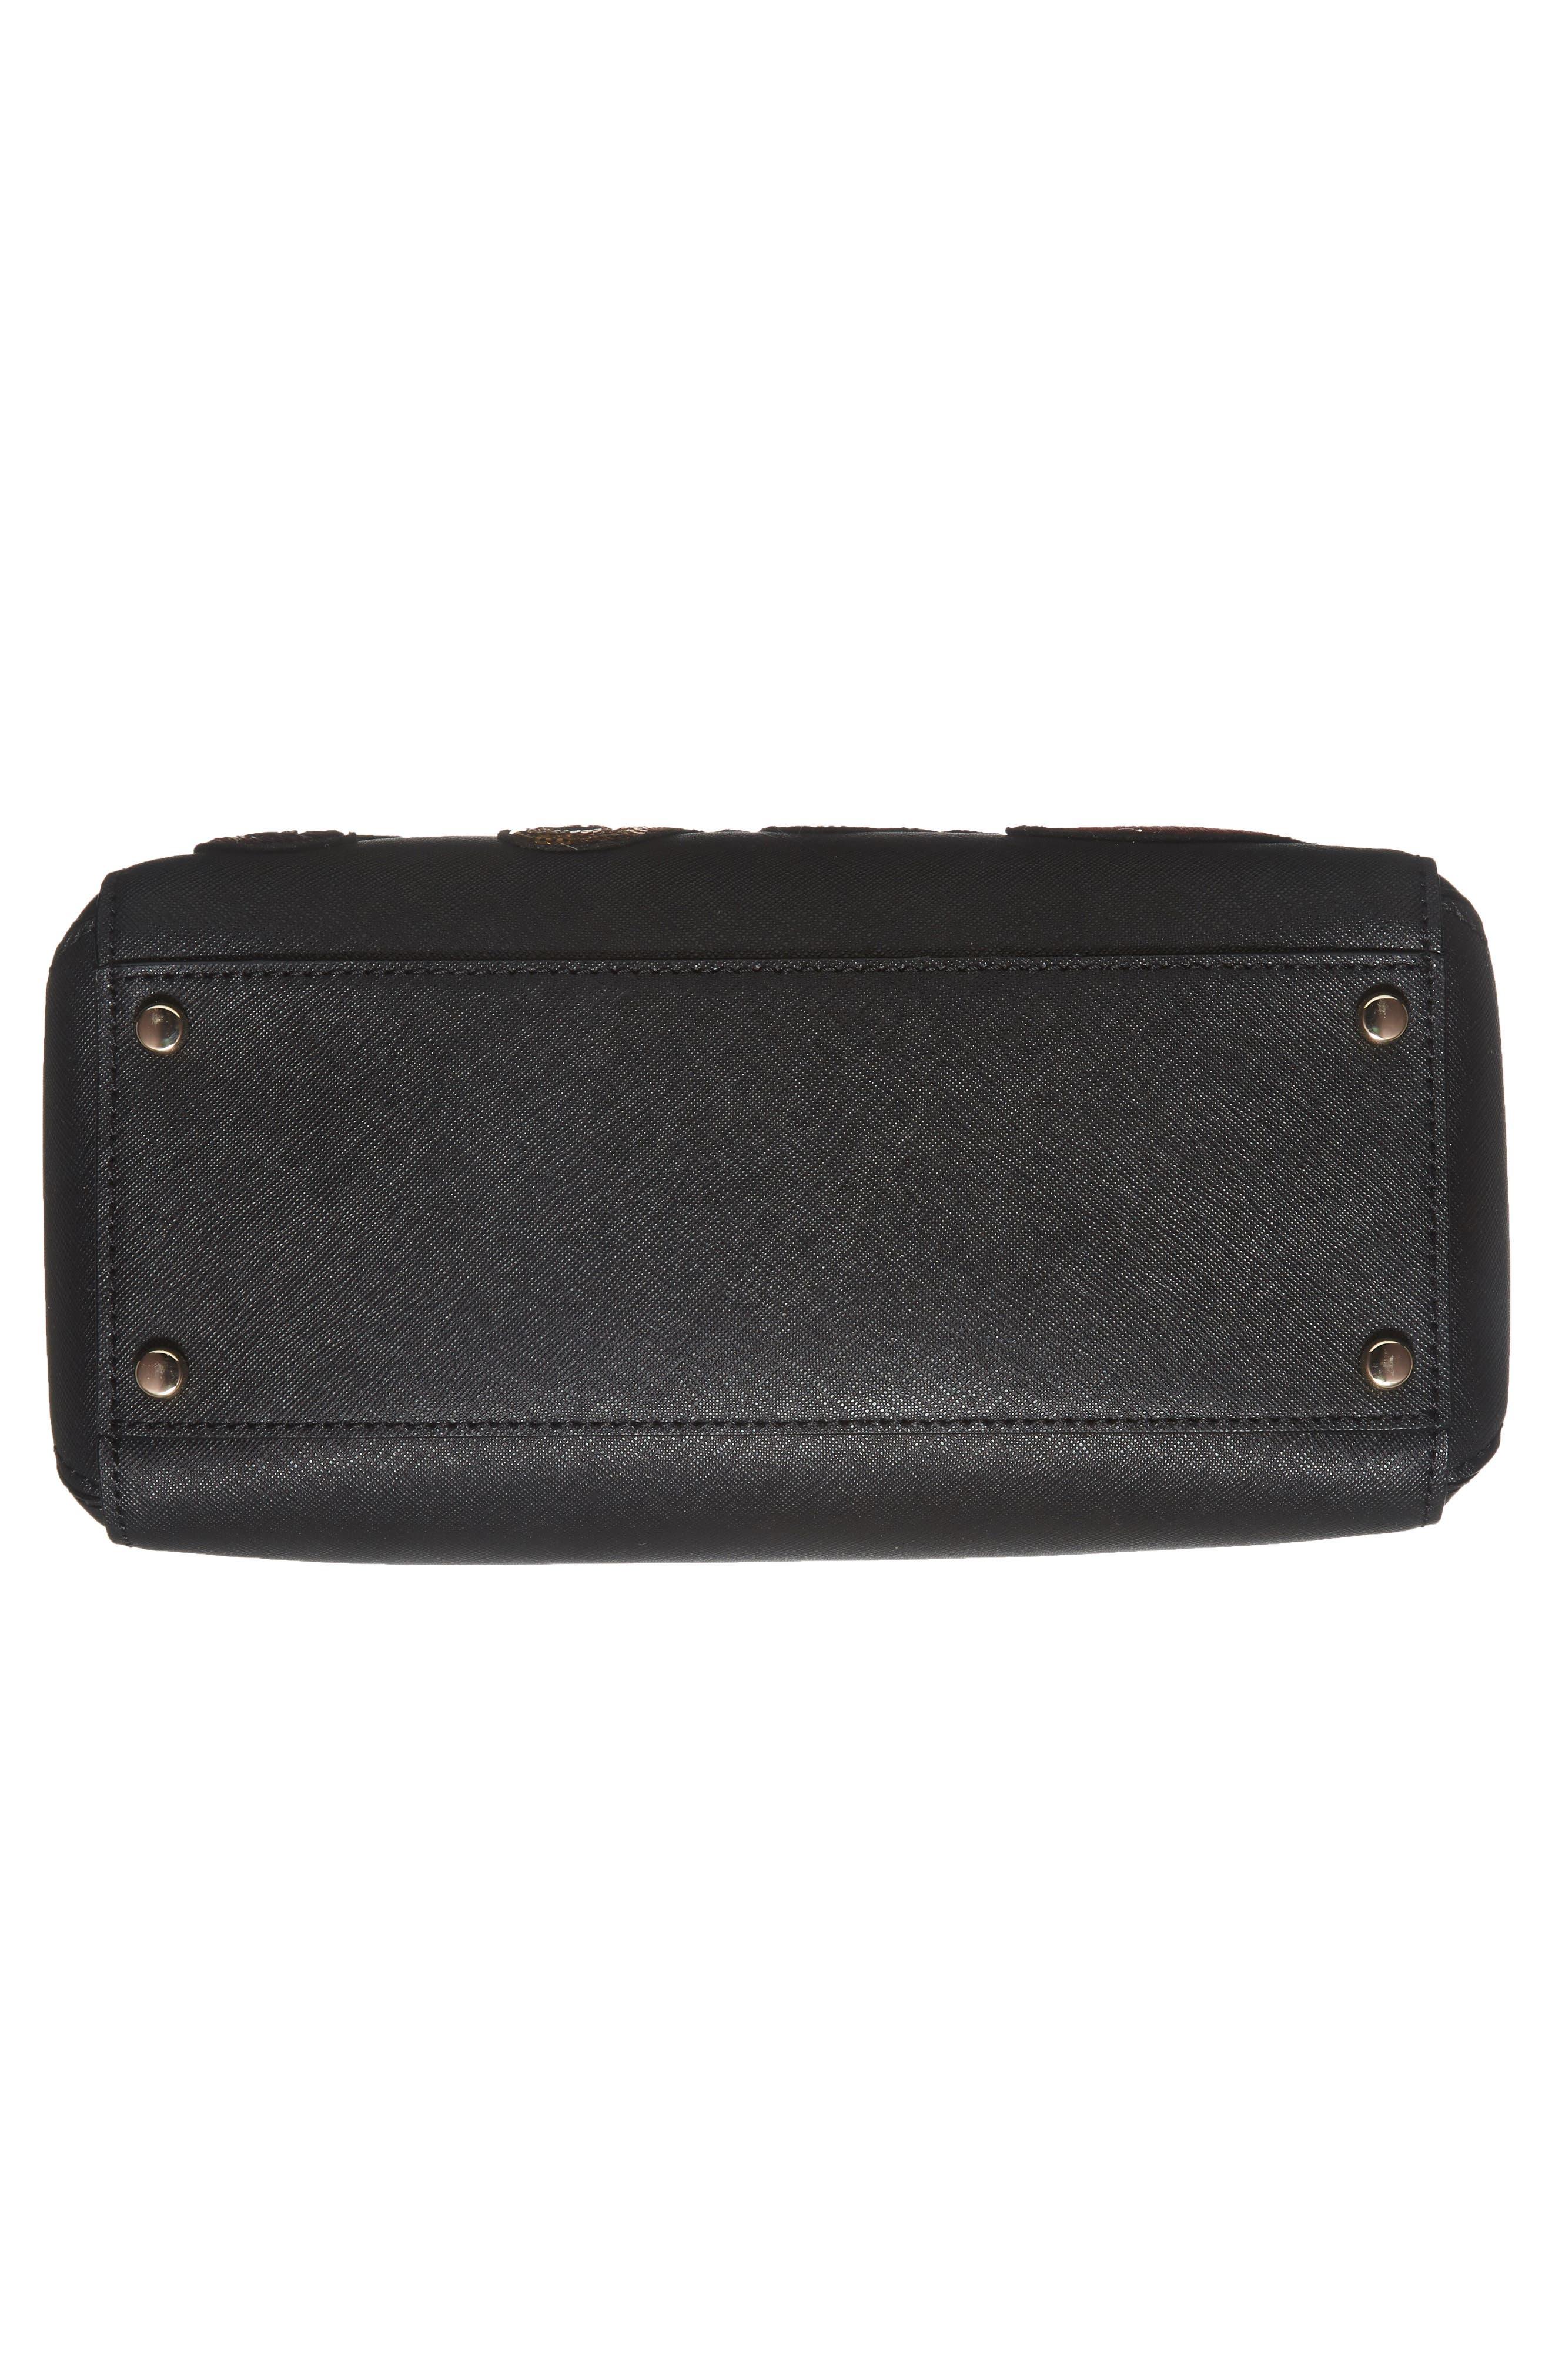 large lane - ma cherie leather satchel,                             Alternate thumbnail 6, color,                             001